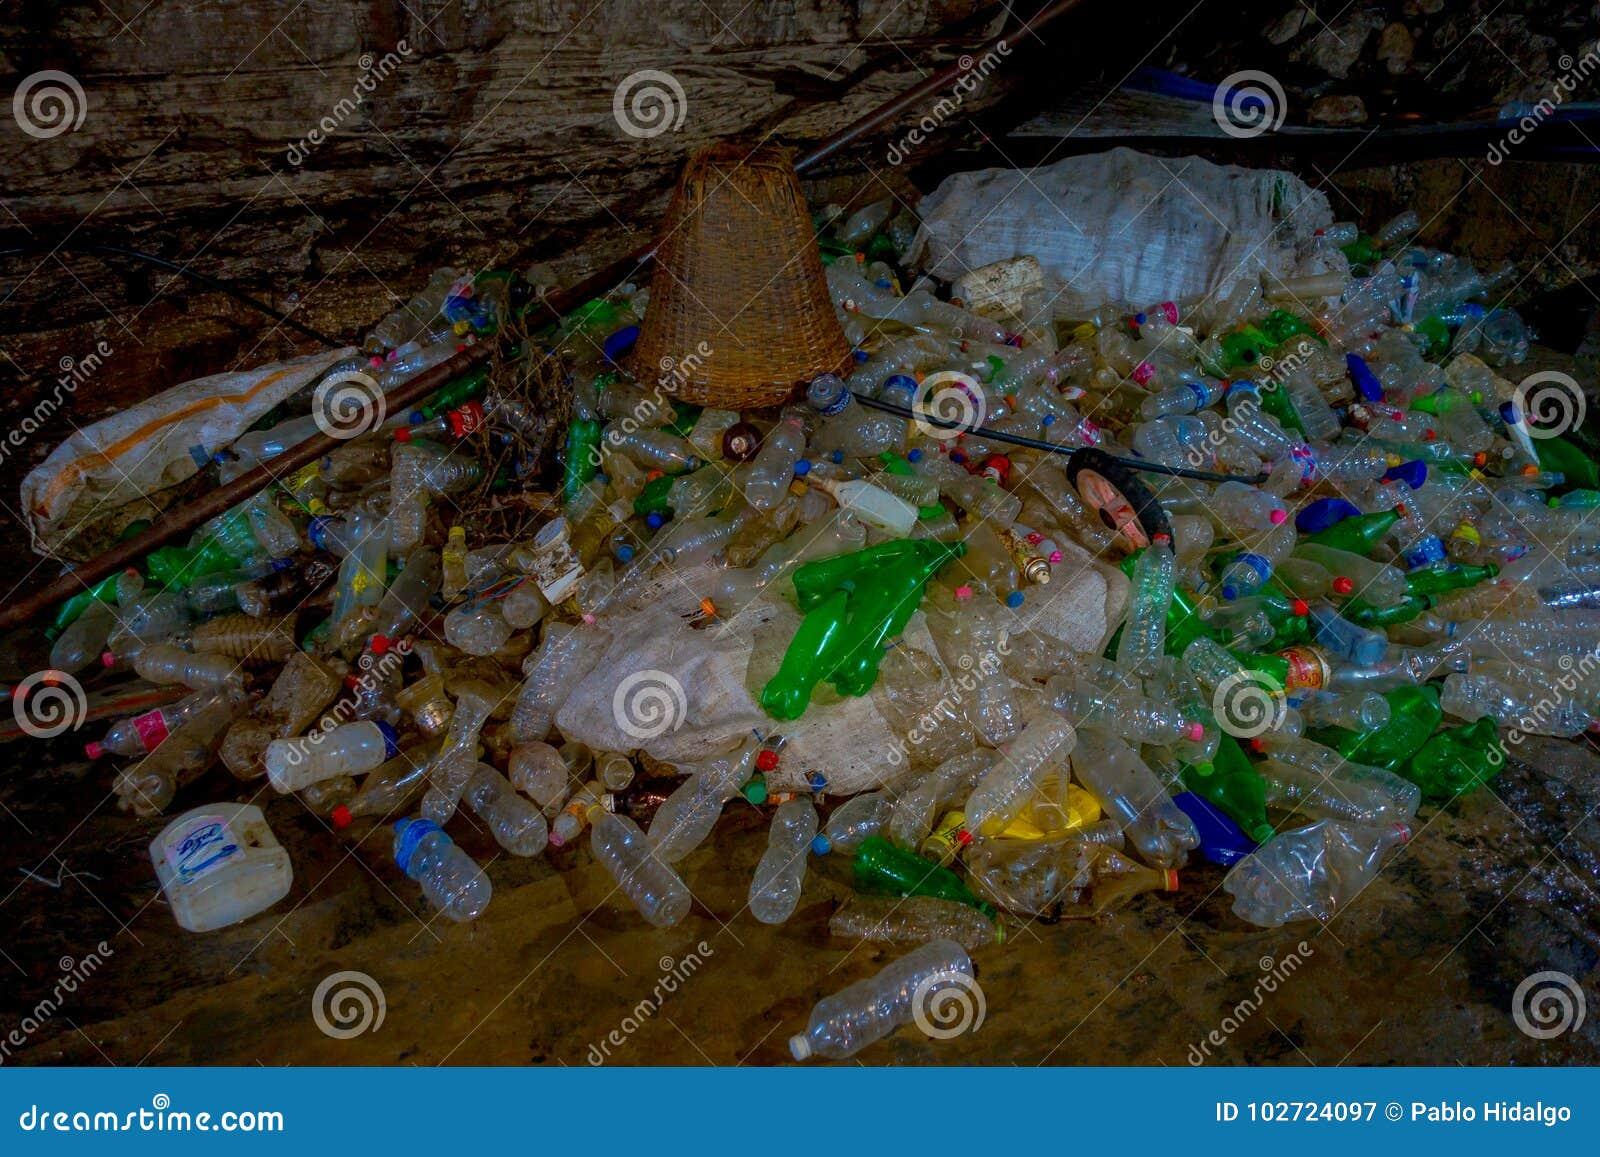 DEHRADUN, ΙΝΔΙΑ - 7 ΝΟΕΜΒΡΊΟΥ 2015: Κλείστε επάνω των απορριμάτων με τα πλαστικά μπουκάλια, καλάθια, σάκοι σε Tapkeshwar Mahadev